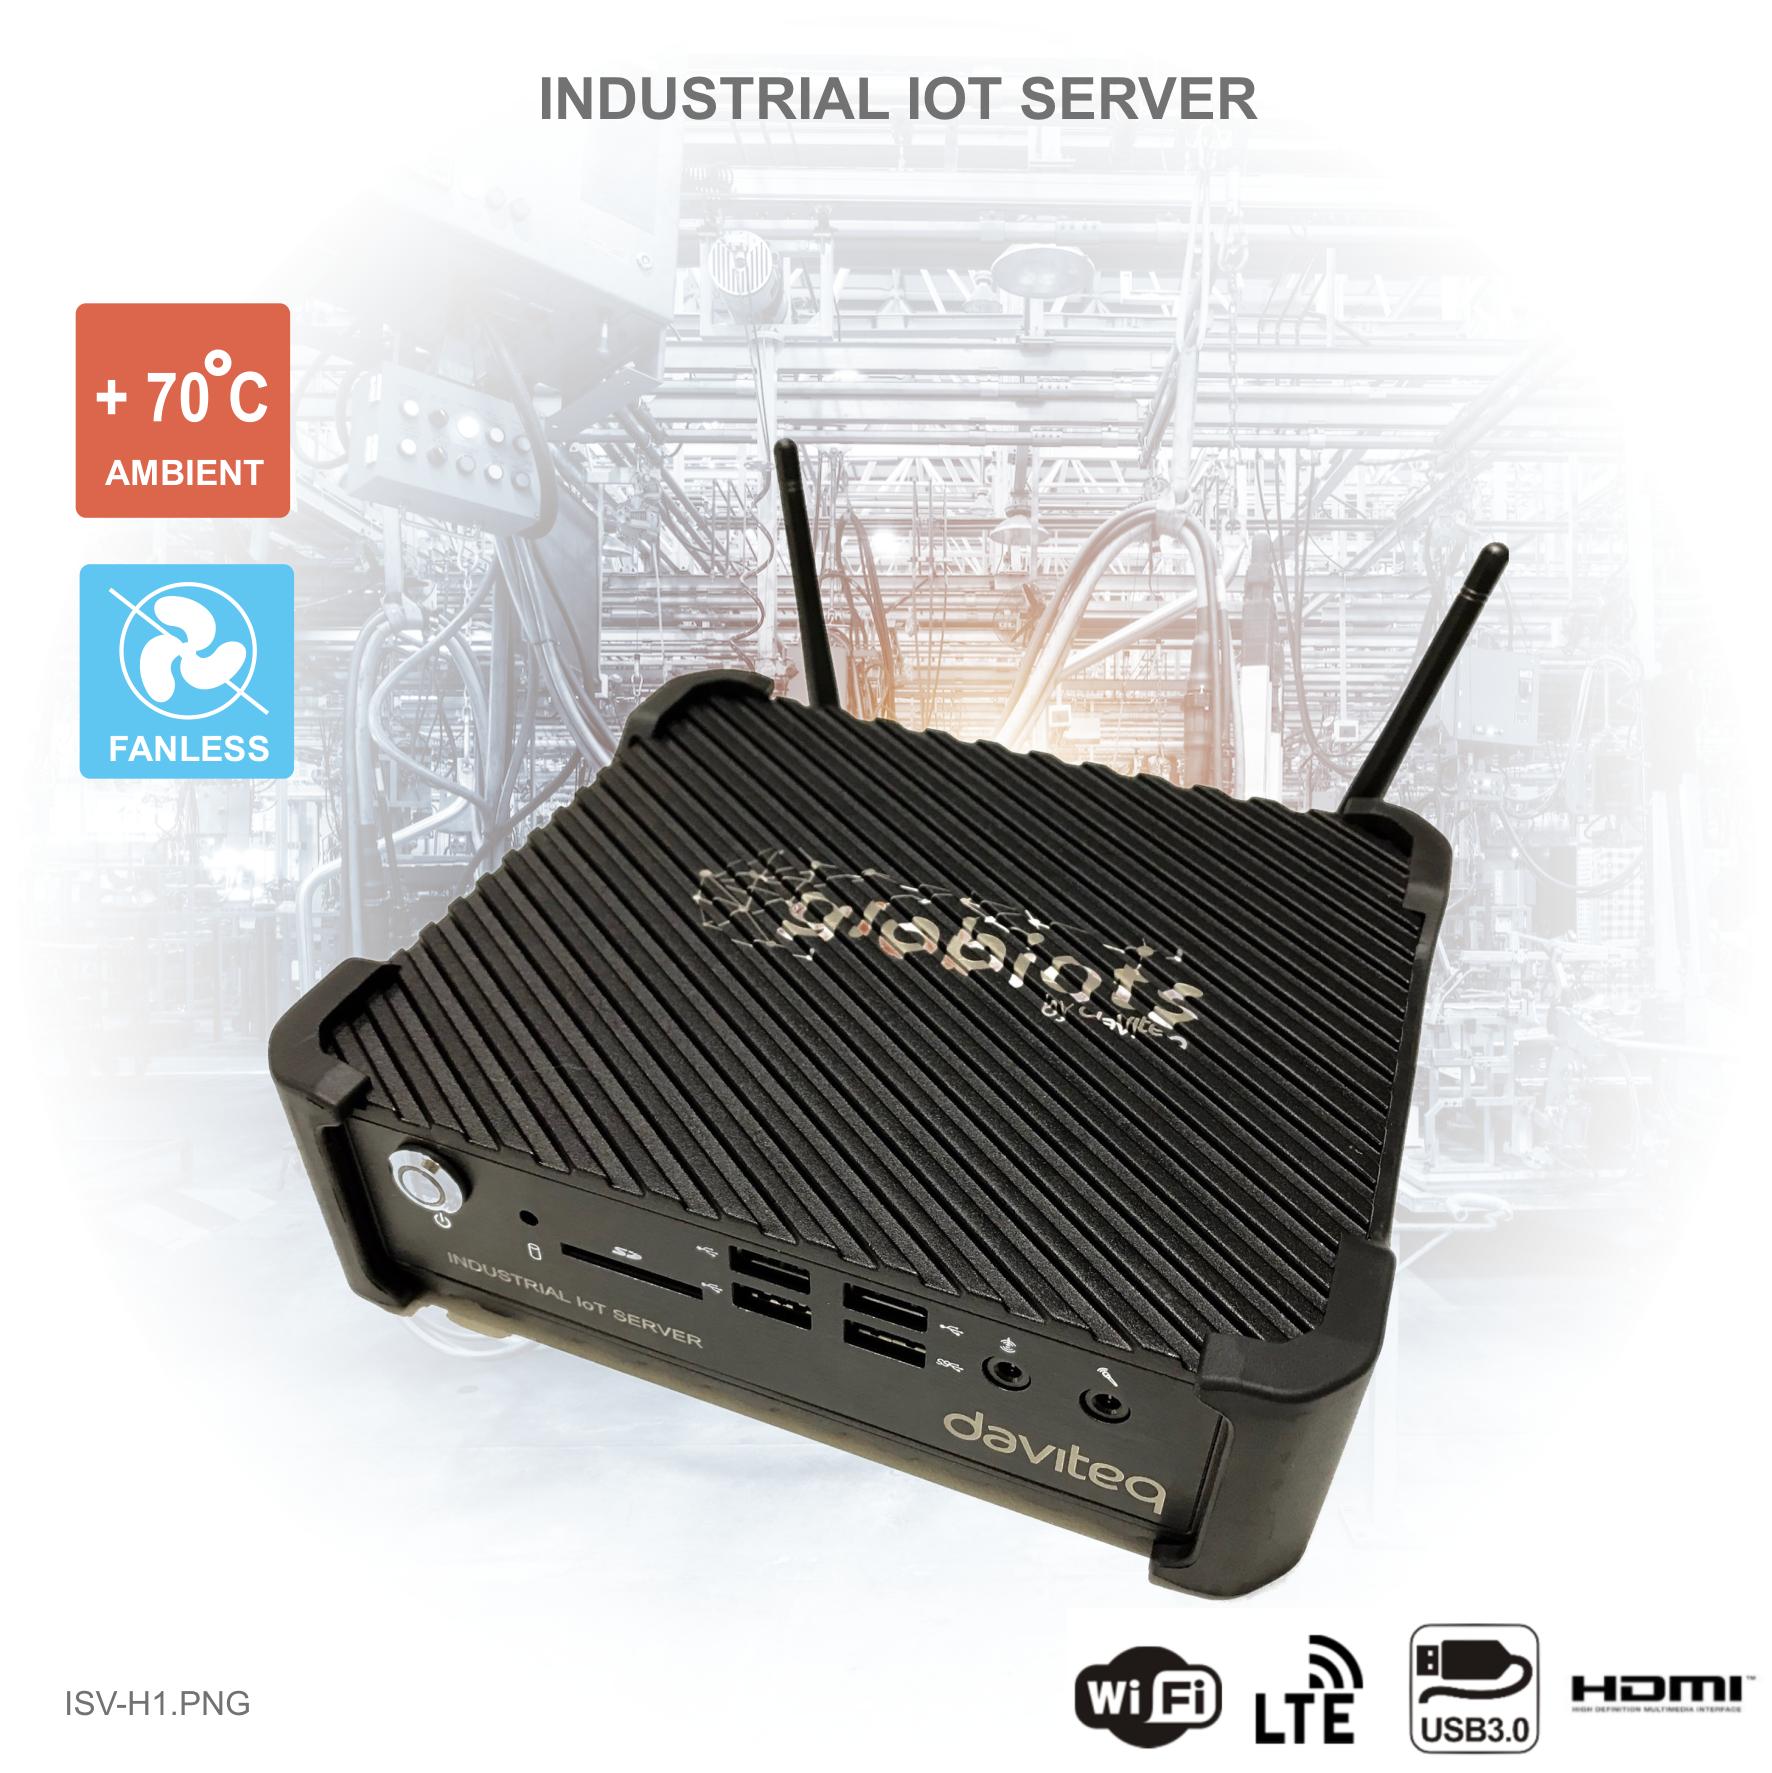 Industrial Globiots Servers